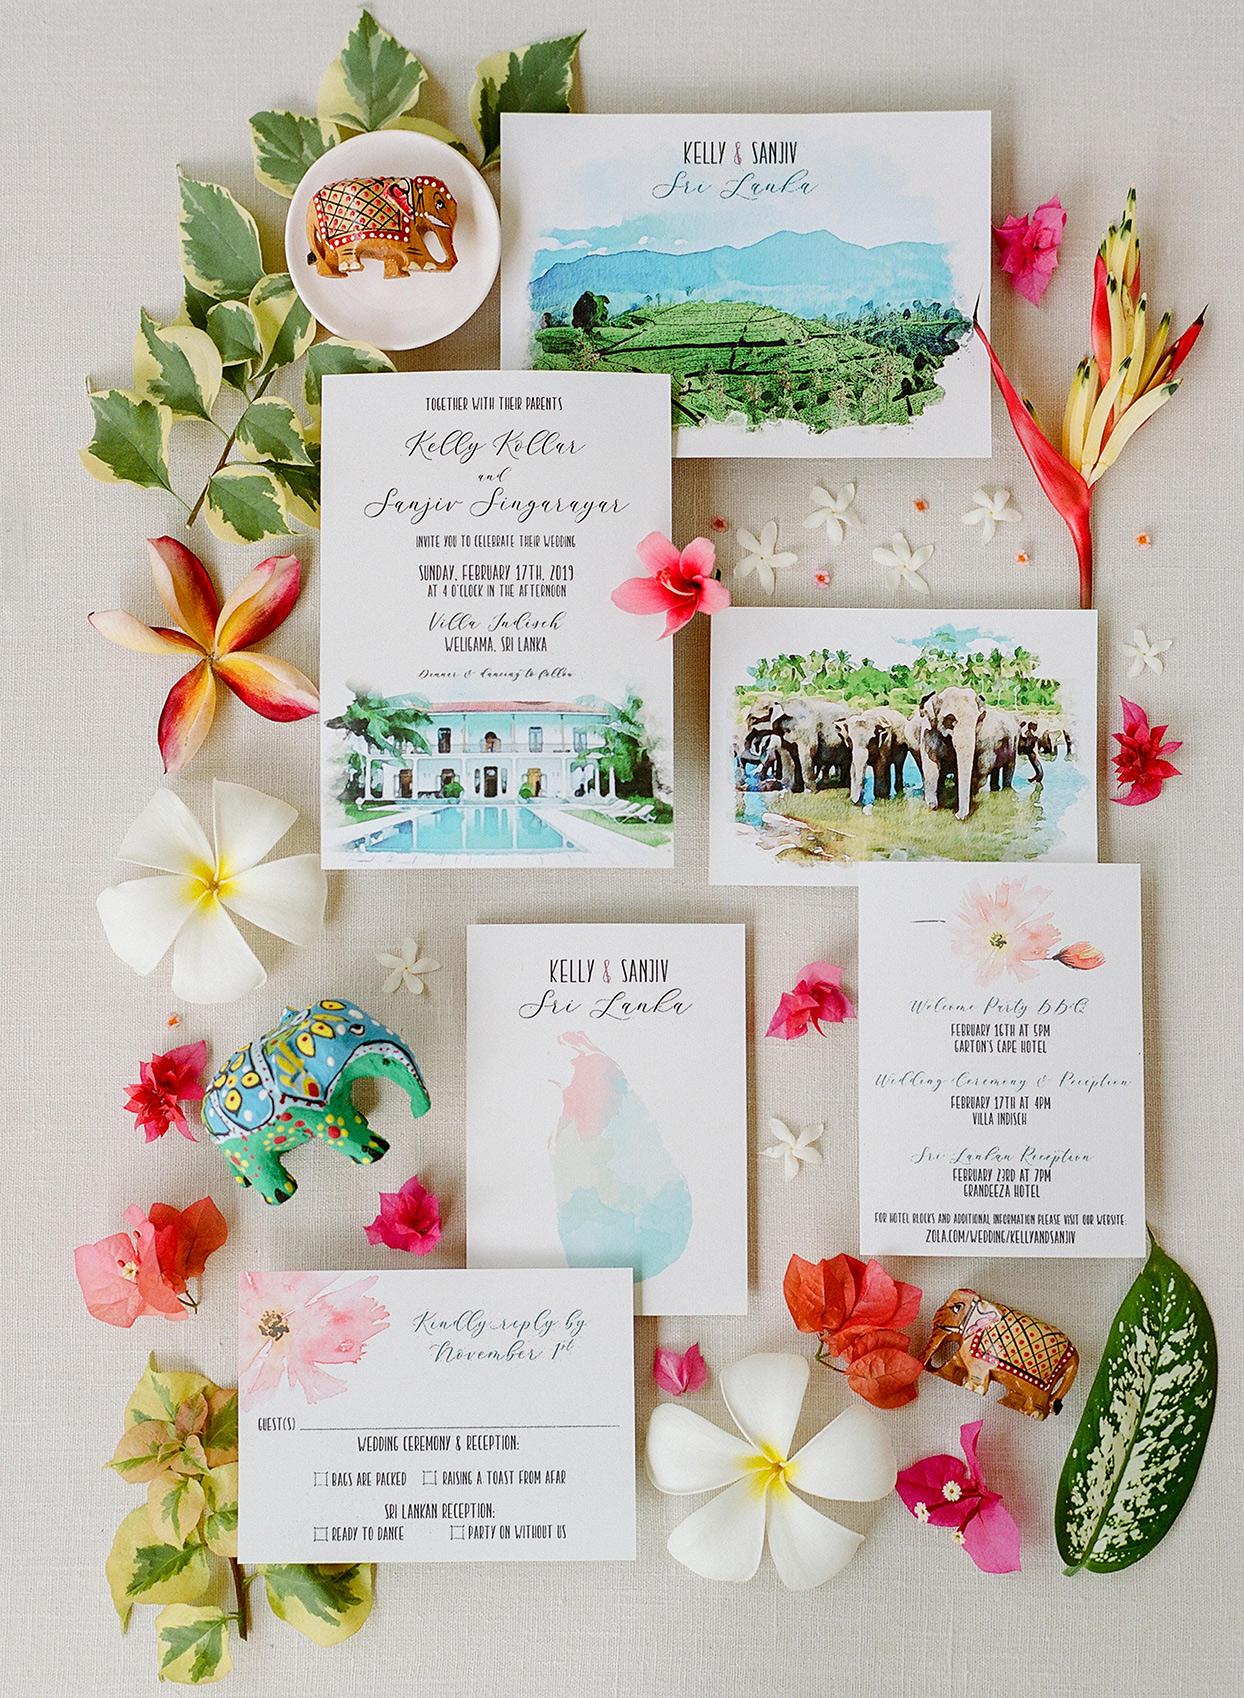 kelly sanjiv wedding colorful invitations